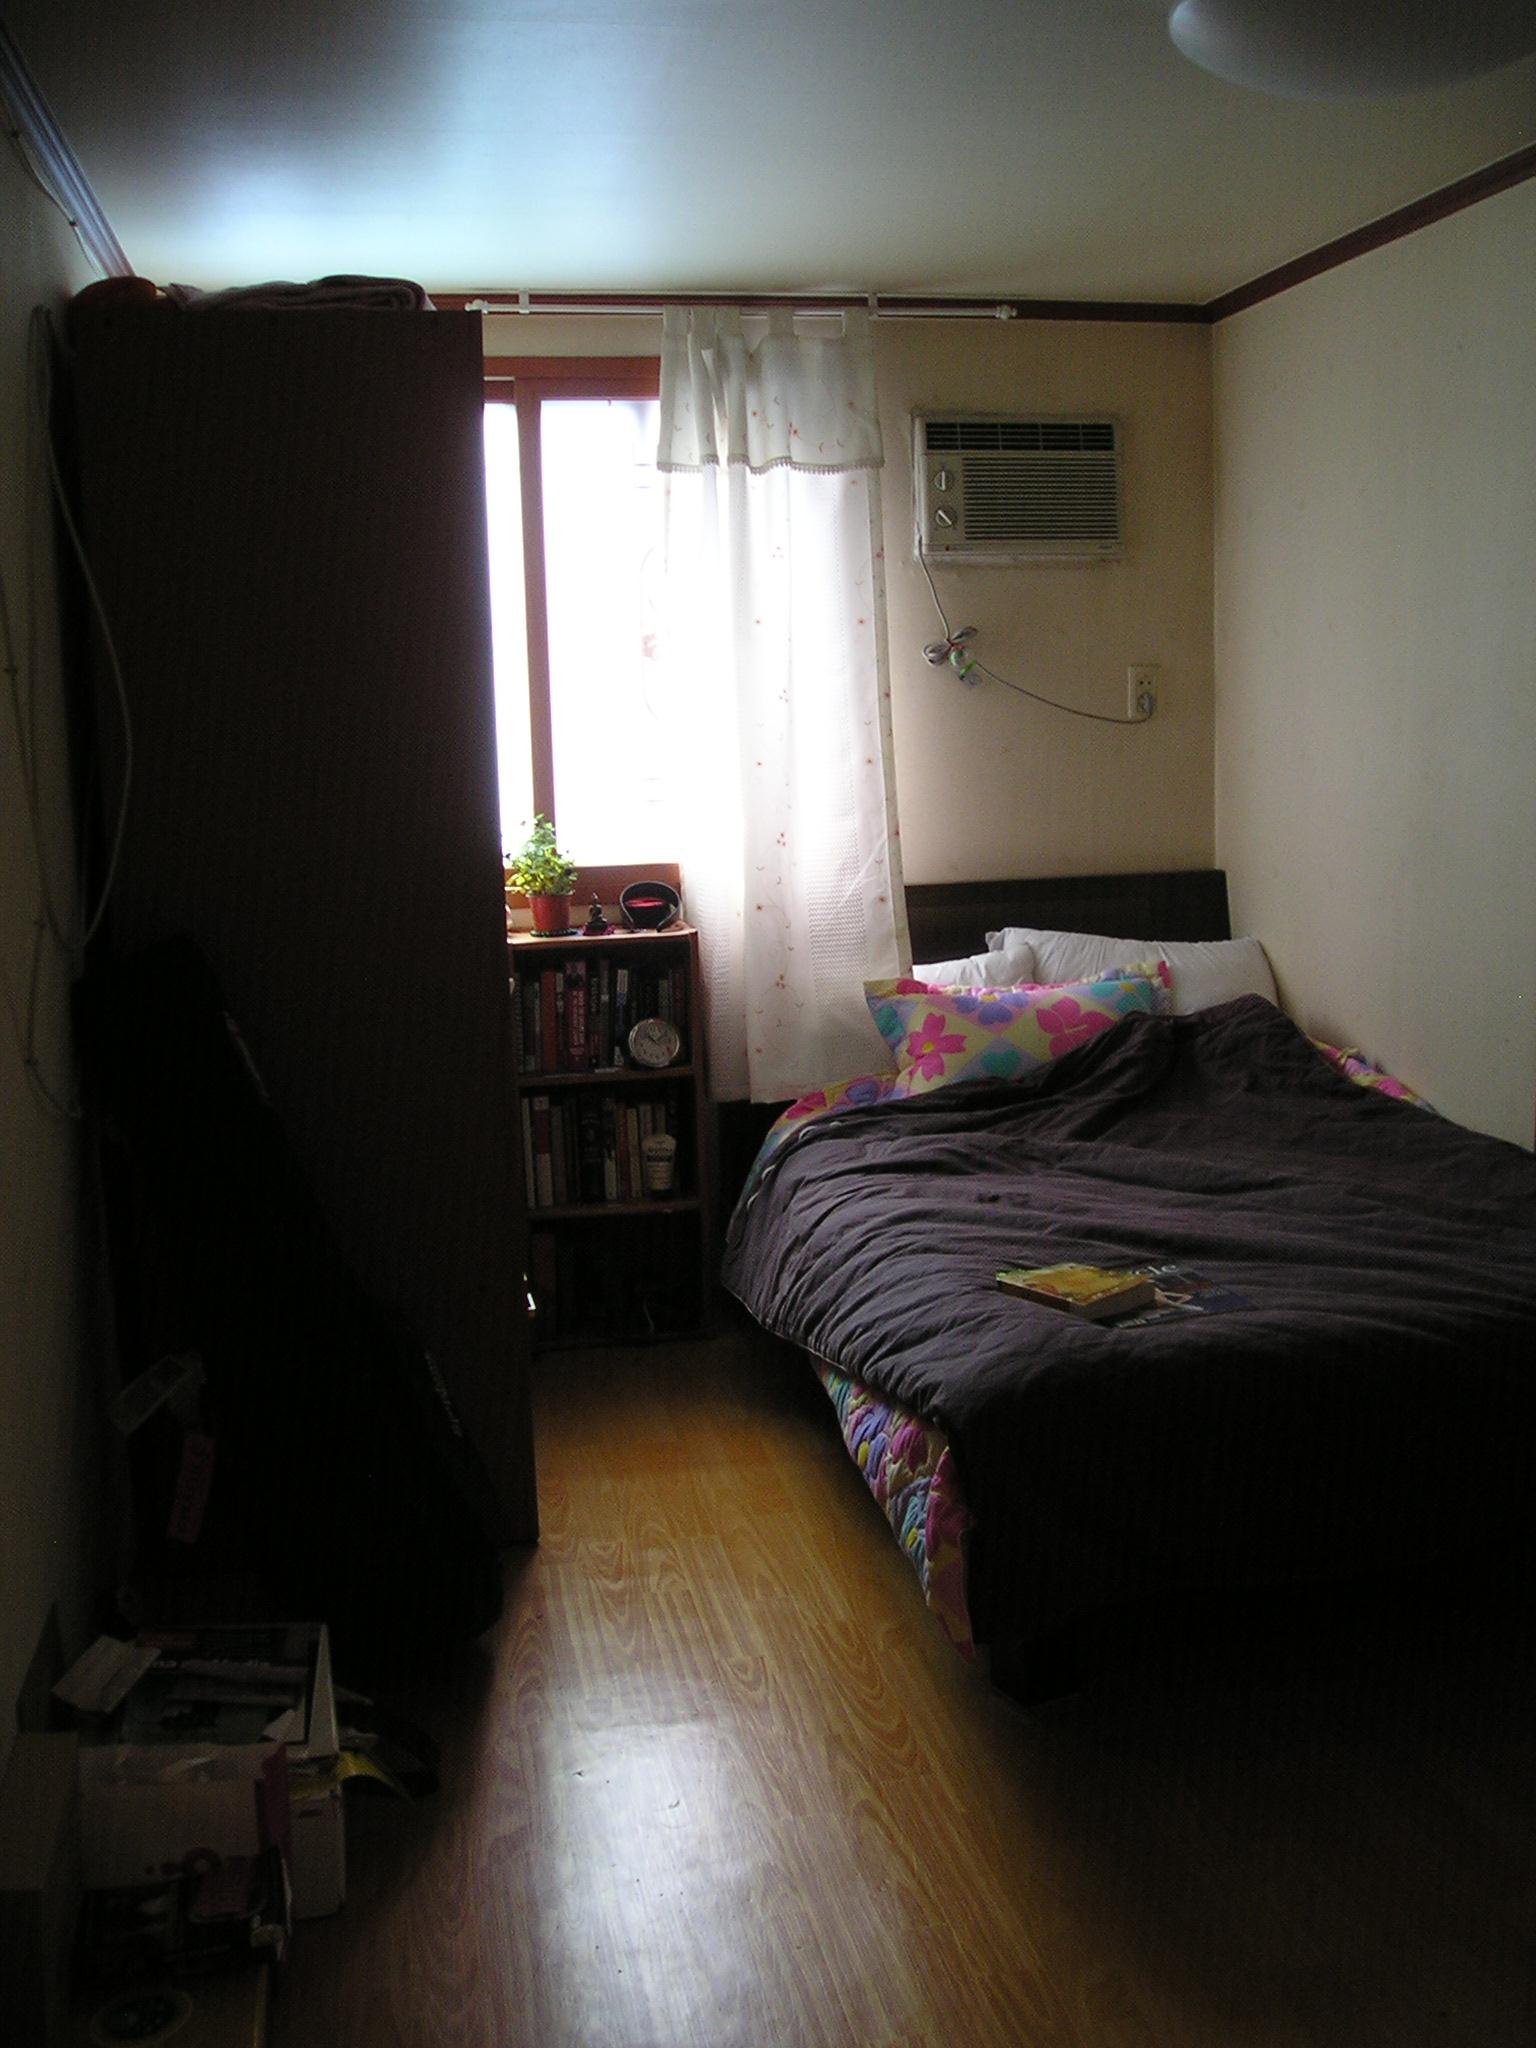 The main room/livingroom/bedroom/closet